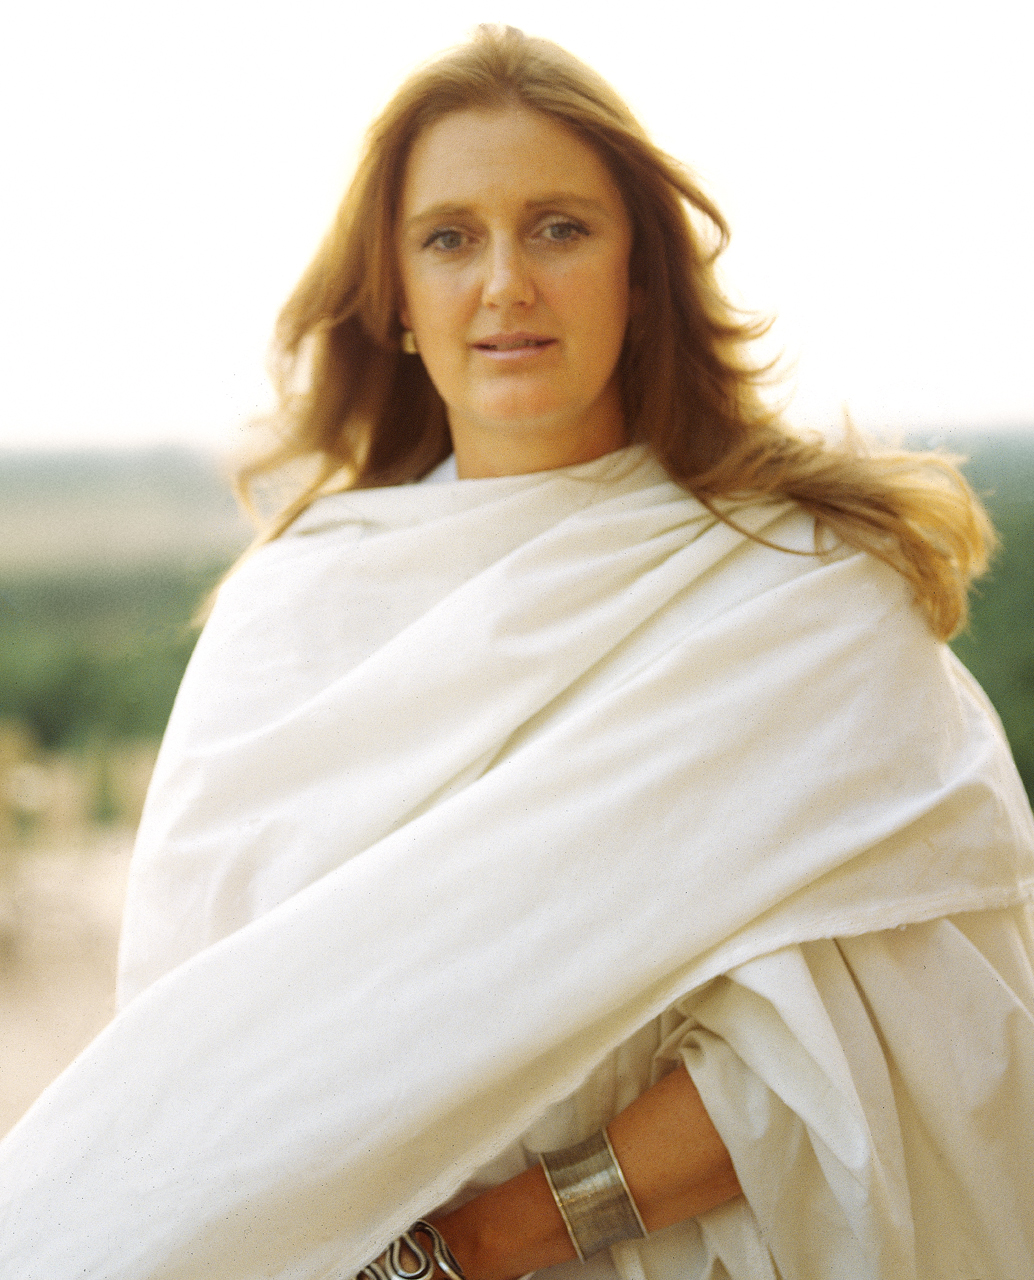 Francessca-Thyssen-White-robe.jpg